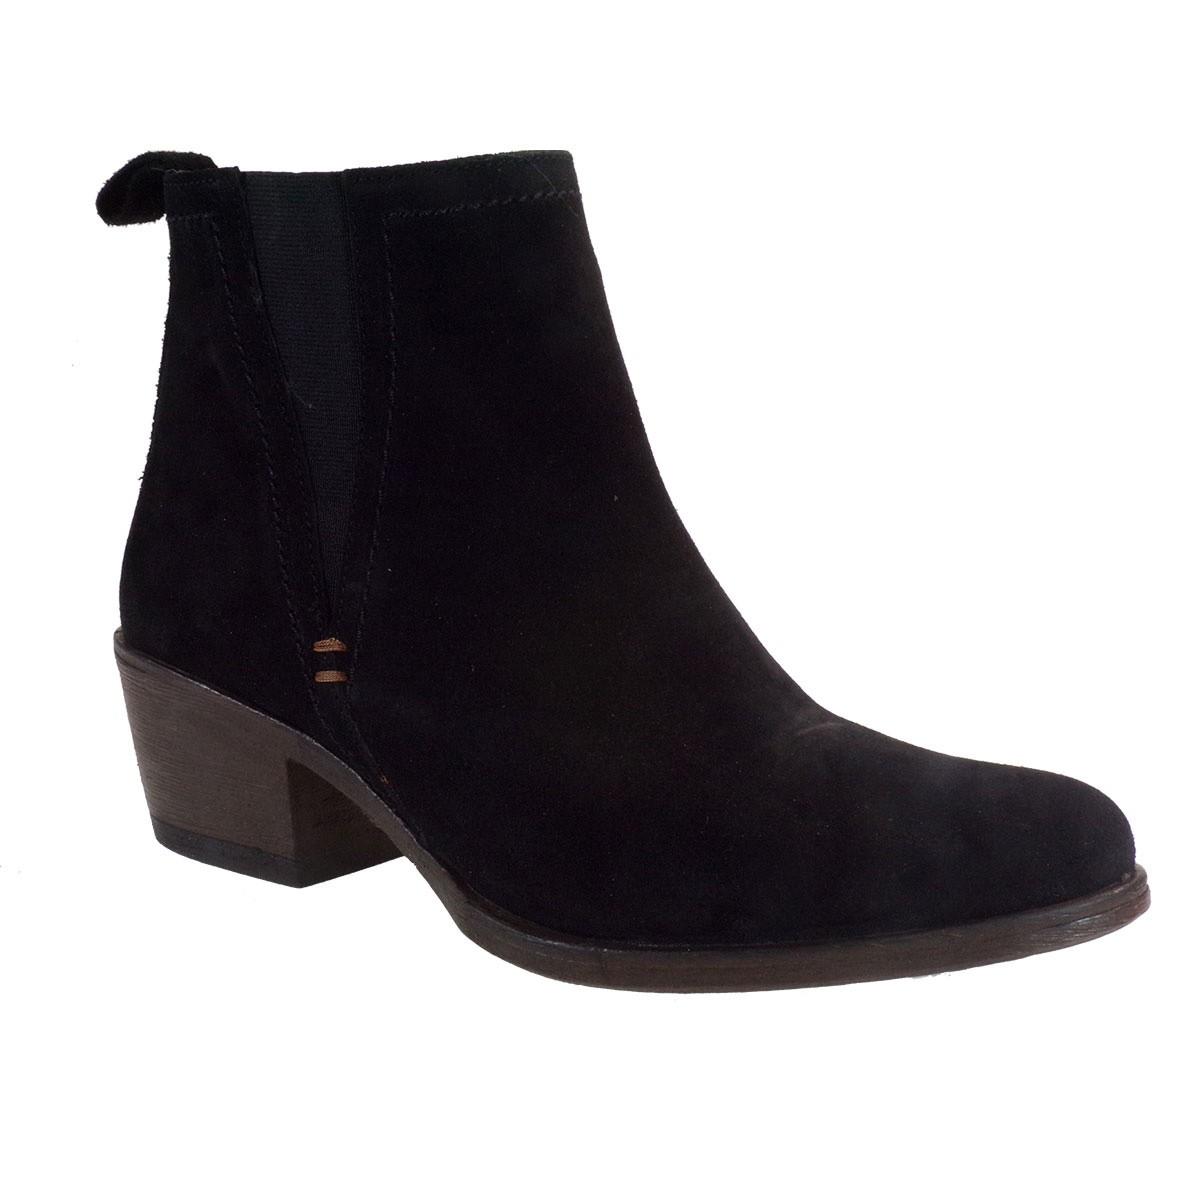 Commanchero Γυναικεία Παπούτσια Μποτάκια COW BOY 5569-421 Μαύρο Καστόρι Δέρμα